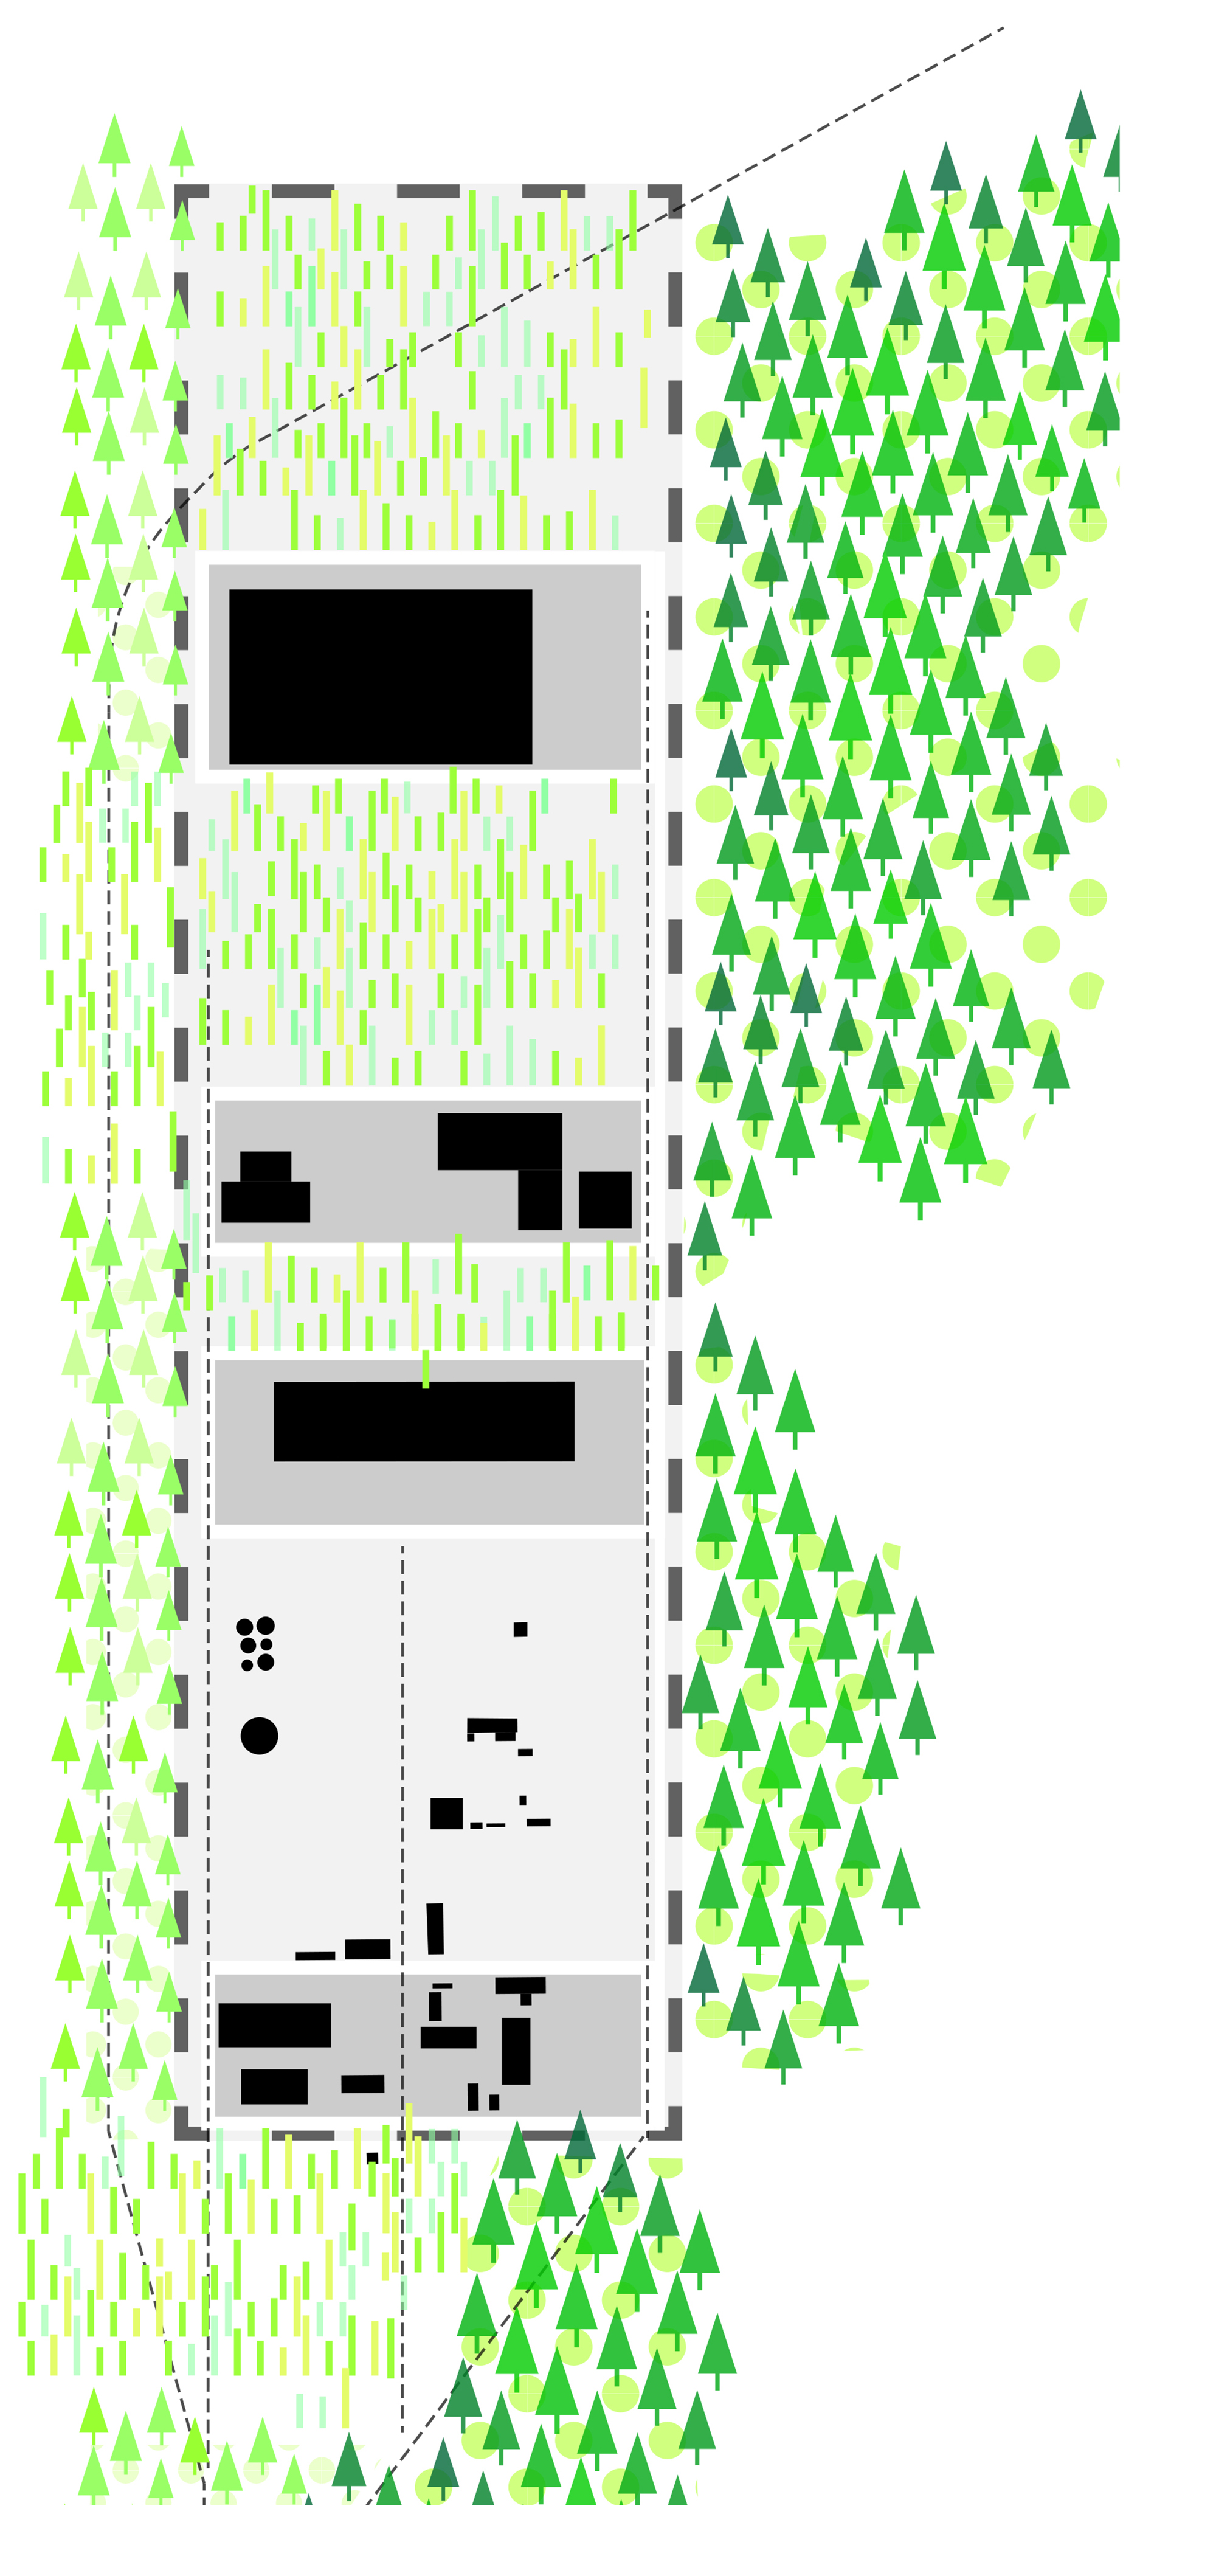 15_diagramma landscape fasing b.jpg